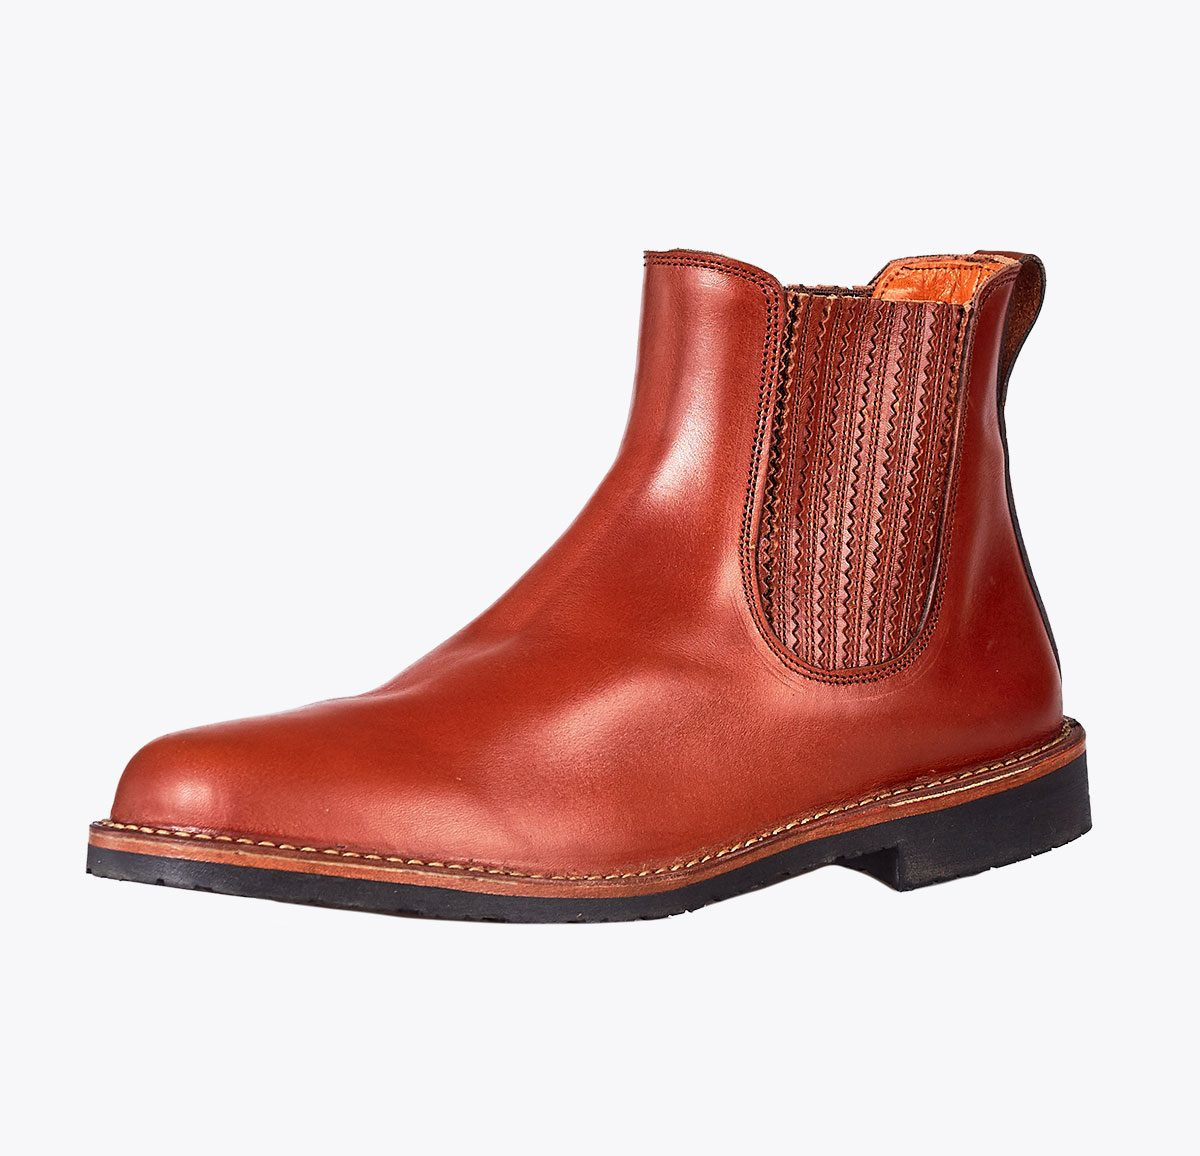 Botín Moldeada, tailor made shoes, schuhe nach mass en mandalashoes Santanyí Mallorca